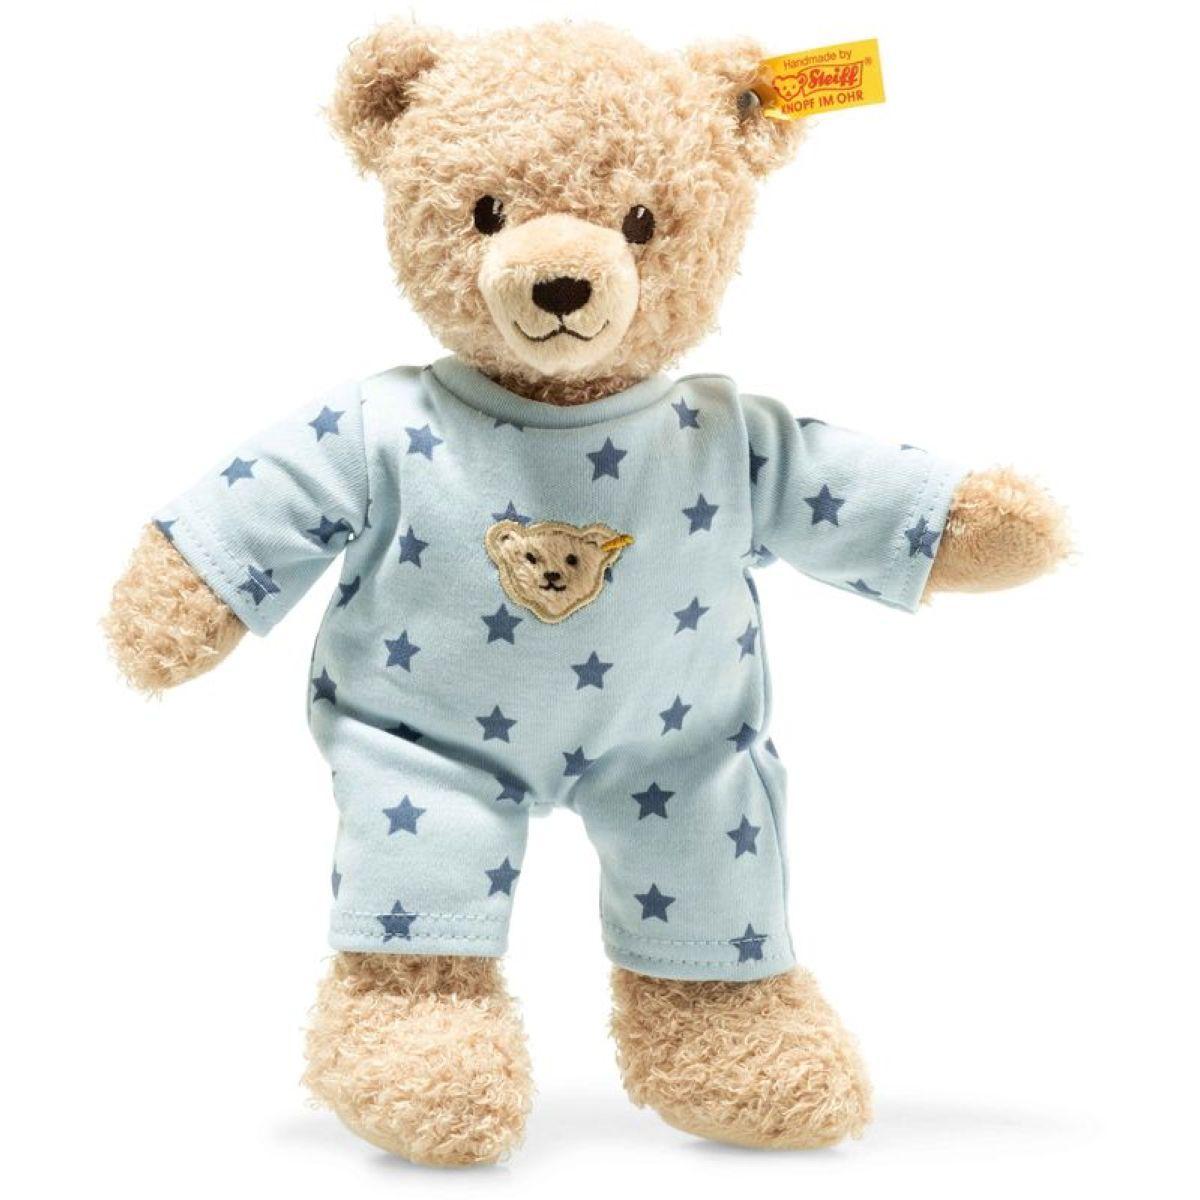 a274dd3ccc Steiff 241642 Teddy and Me Teddybär Junge Baby mit Schlafanzug, Plüsch, 25  cm,